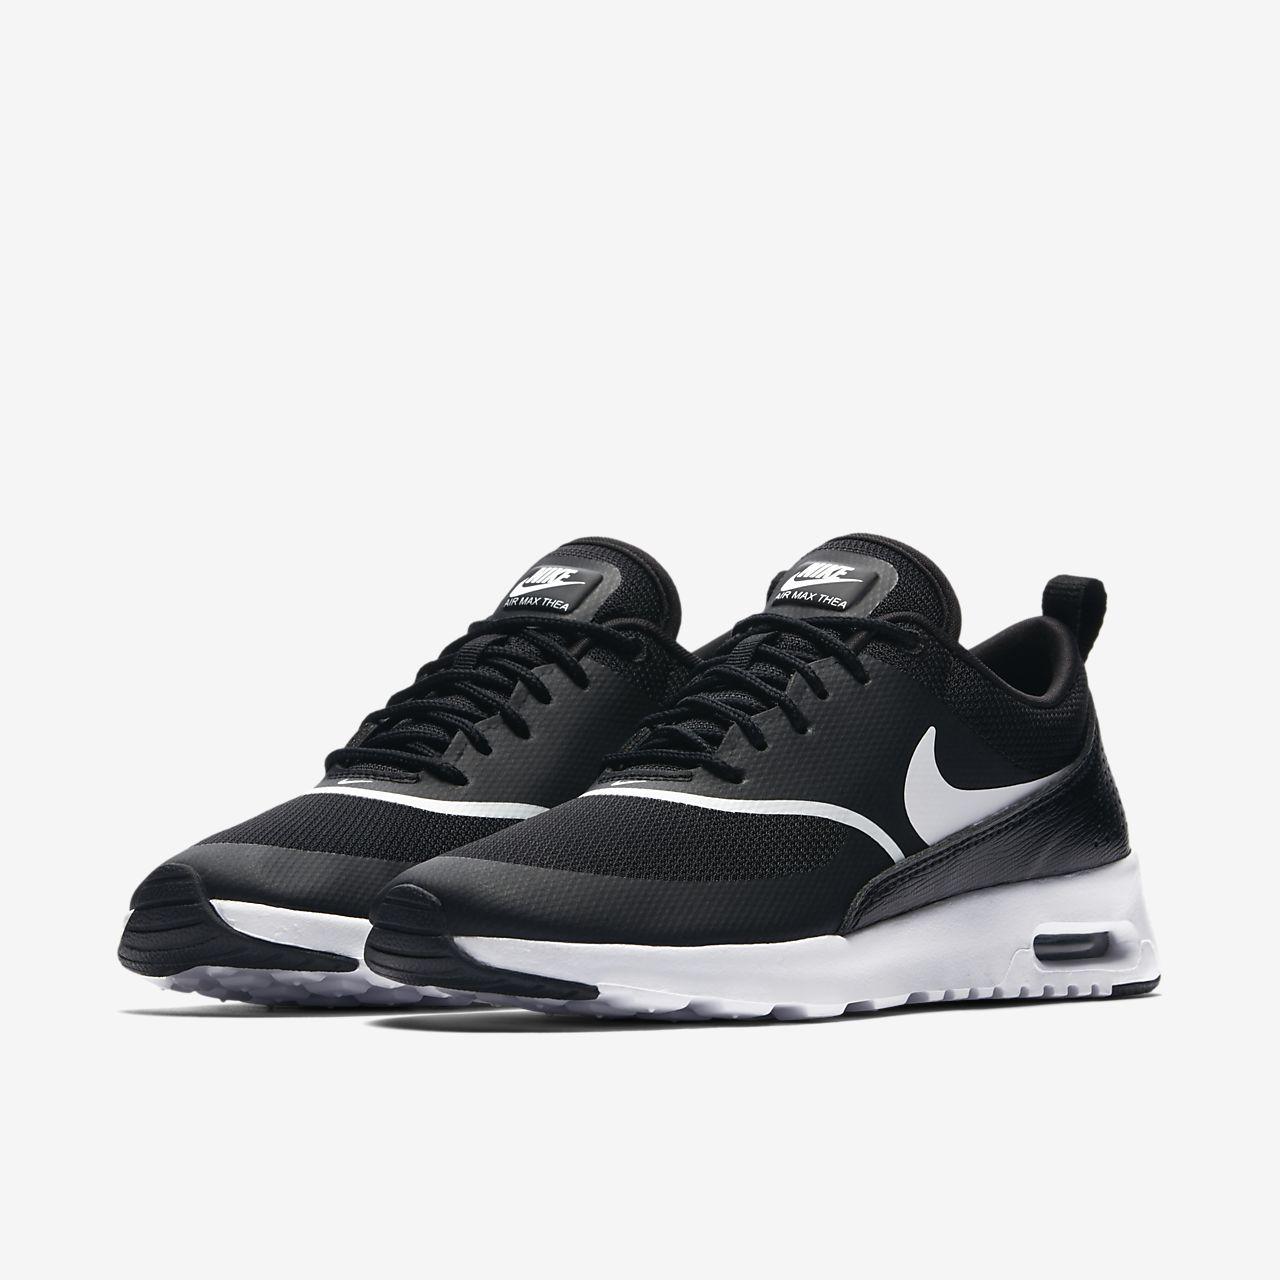 reputable site 5ef84 b85e8 ... Sko Nike Air Max Thea för kvinnor